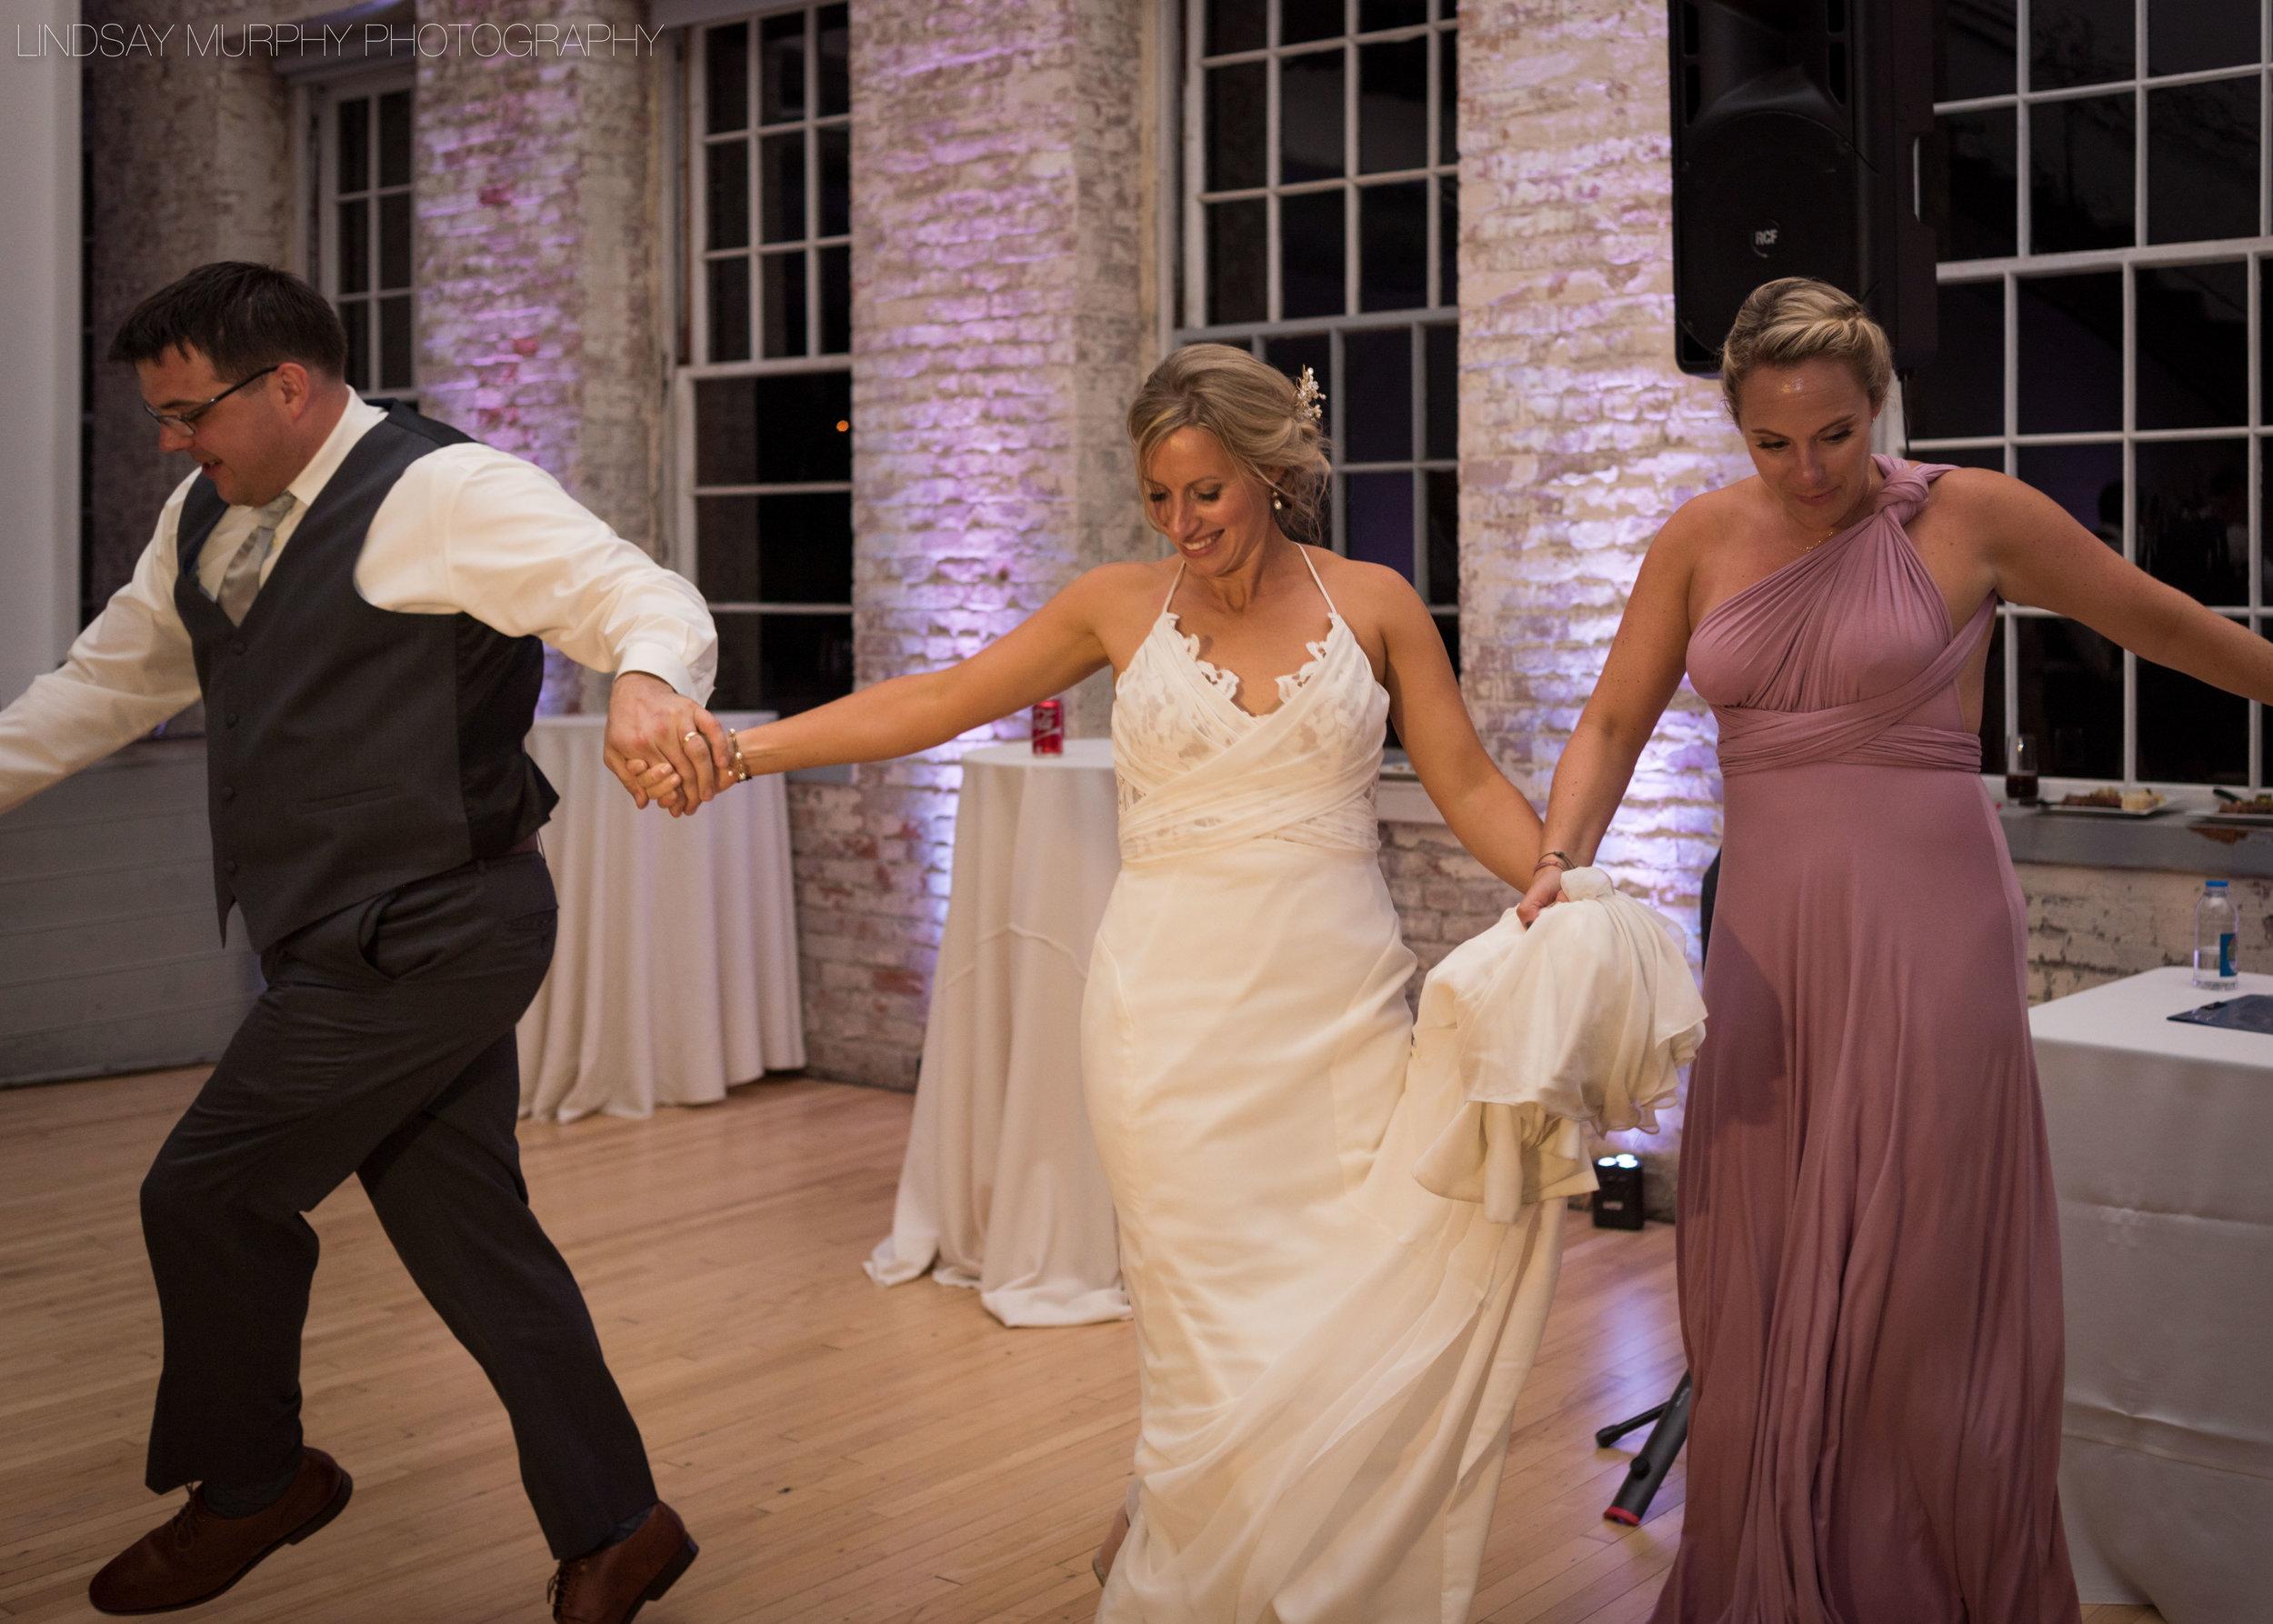 New_England_wedding-86.jpg